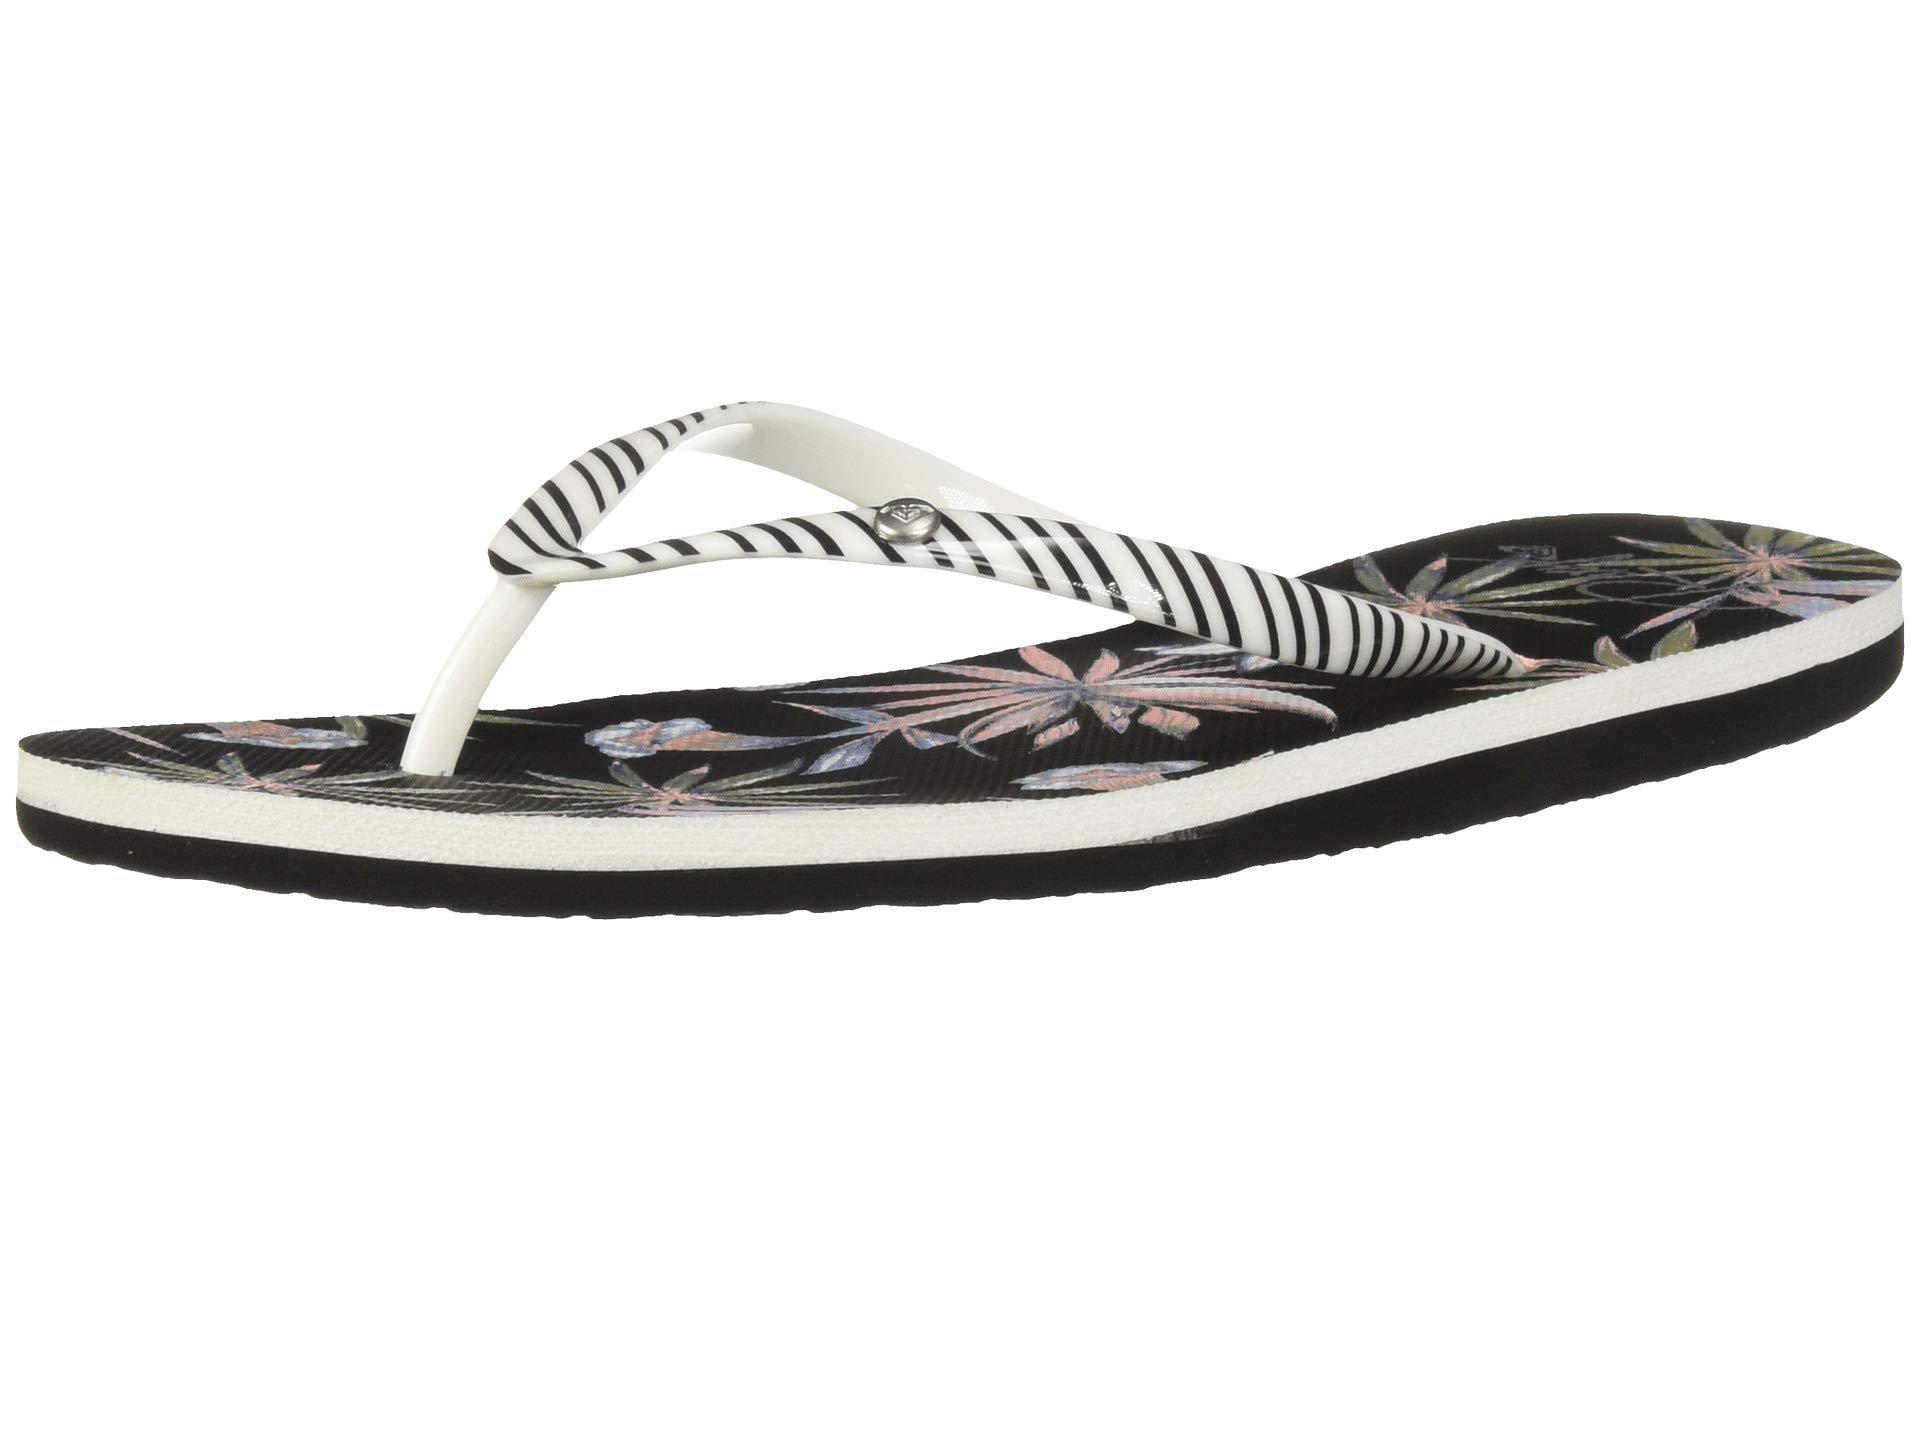 blackwhite Black Ii Fade Portofino Lyst In Sandals Roxy Women's pqCwWAt